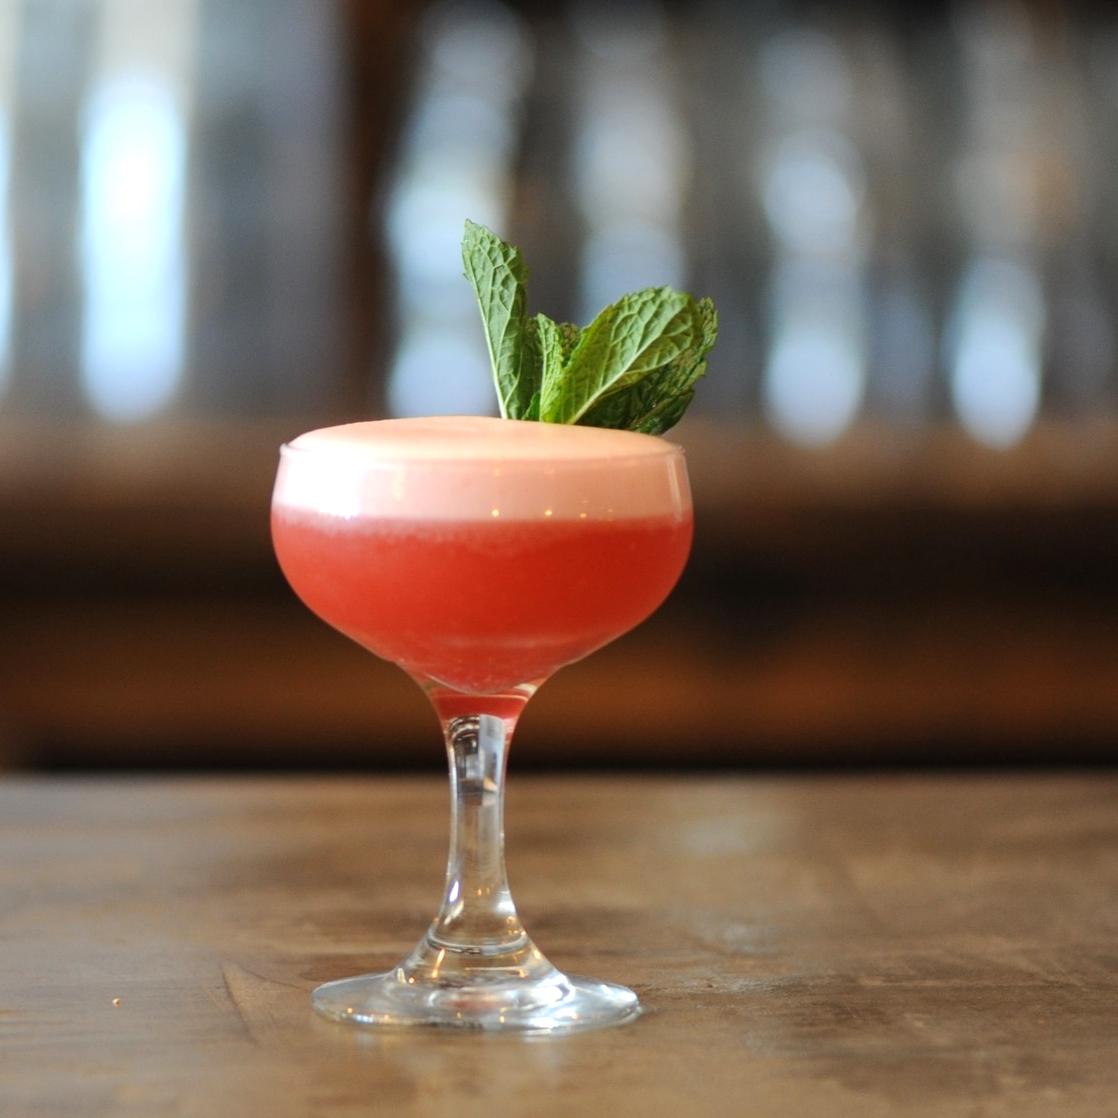 the-cocktail-experiment-syrups-grenadine-clover-leaf.jpg